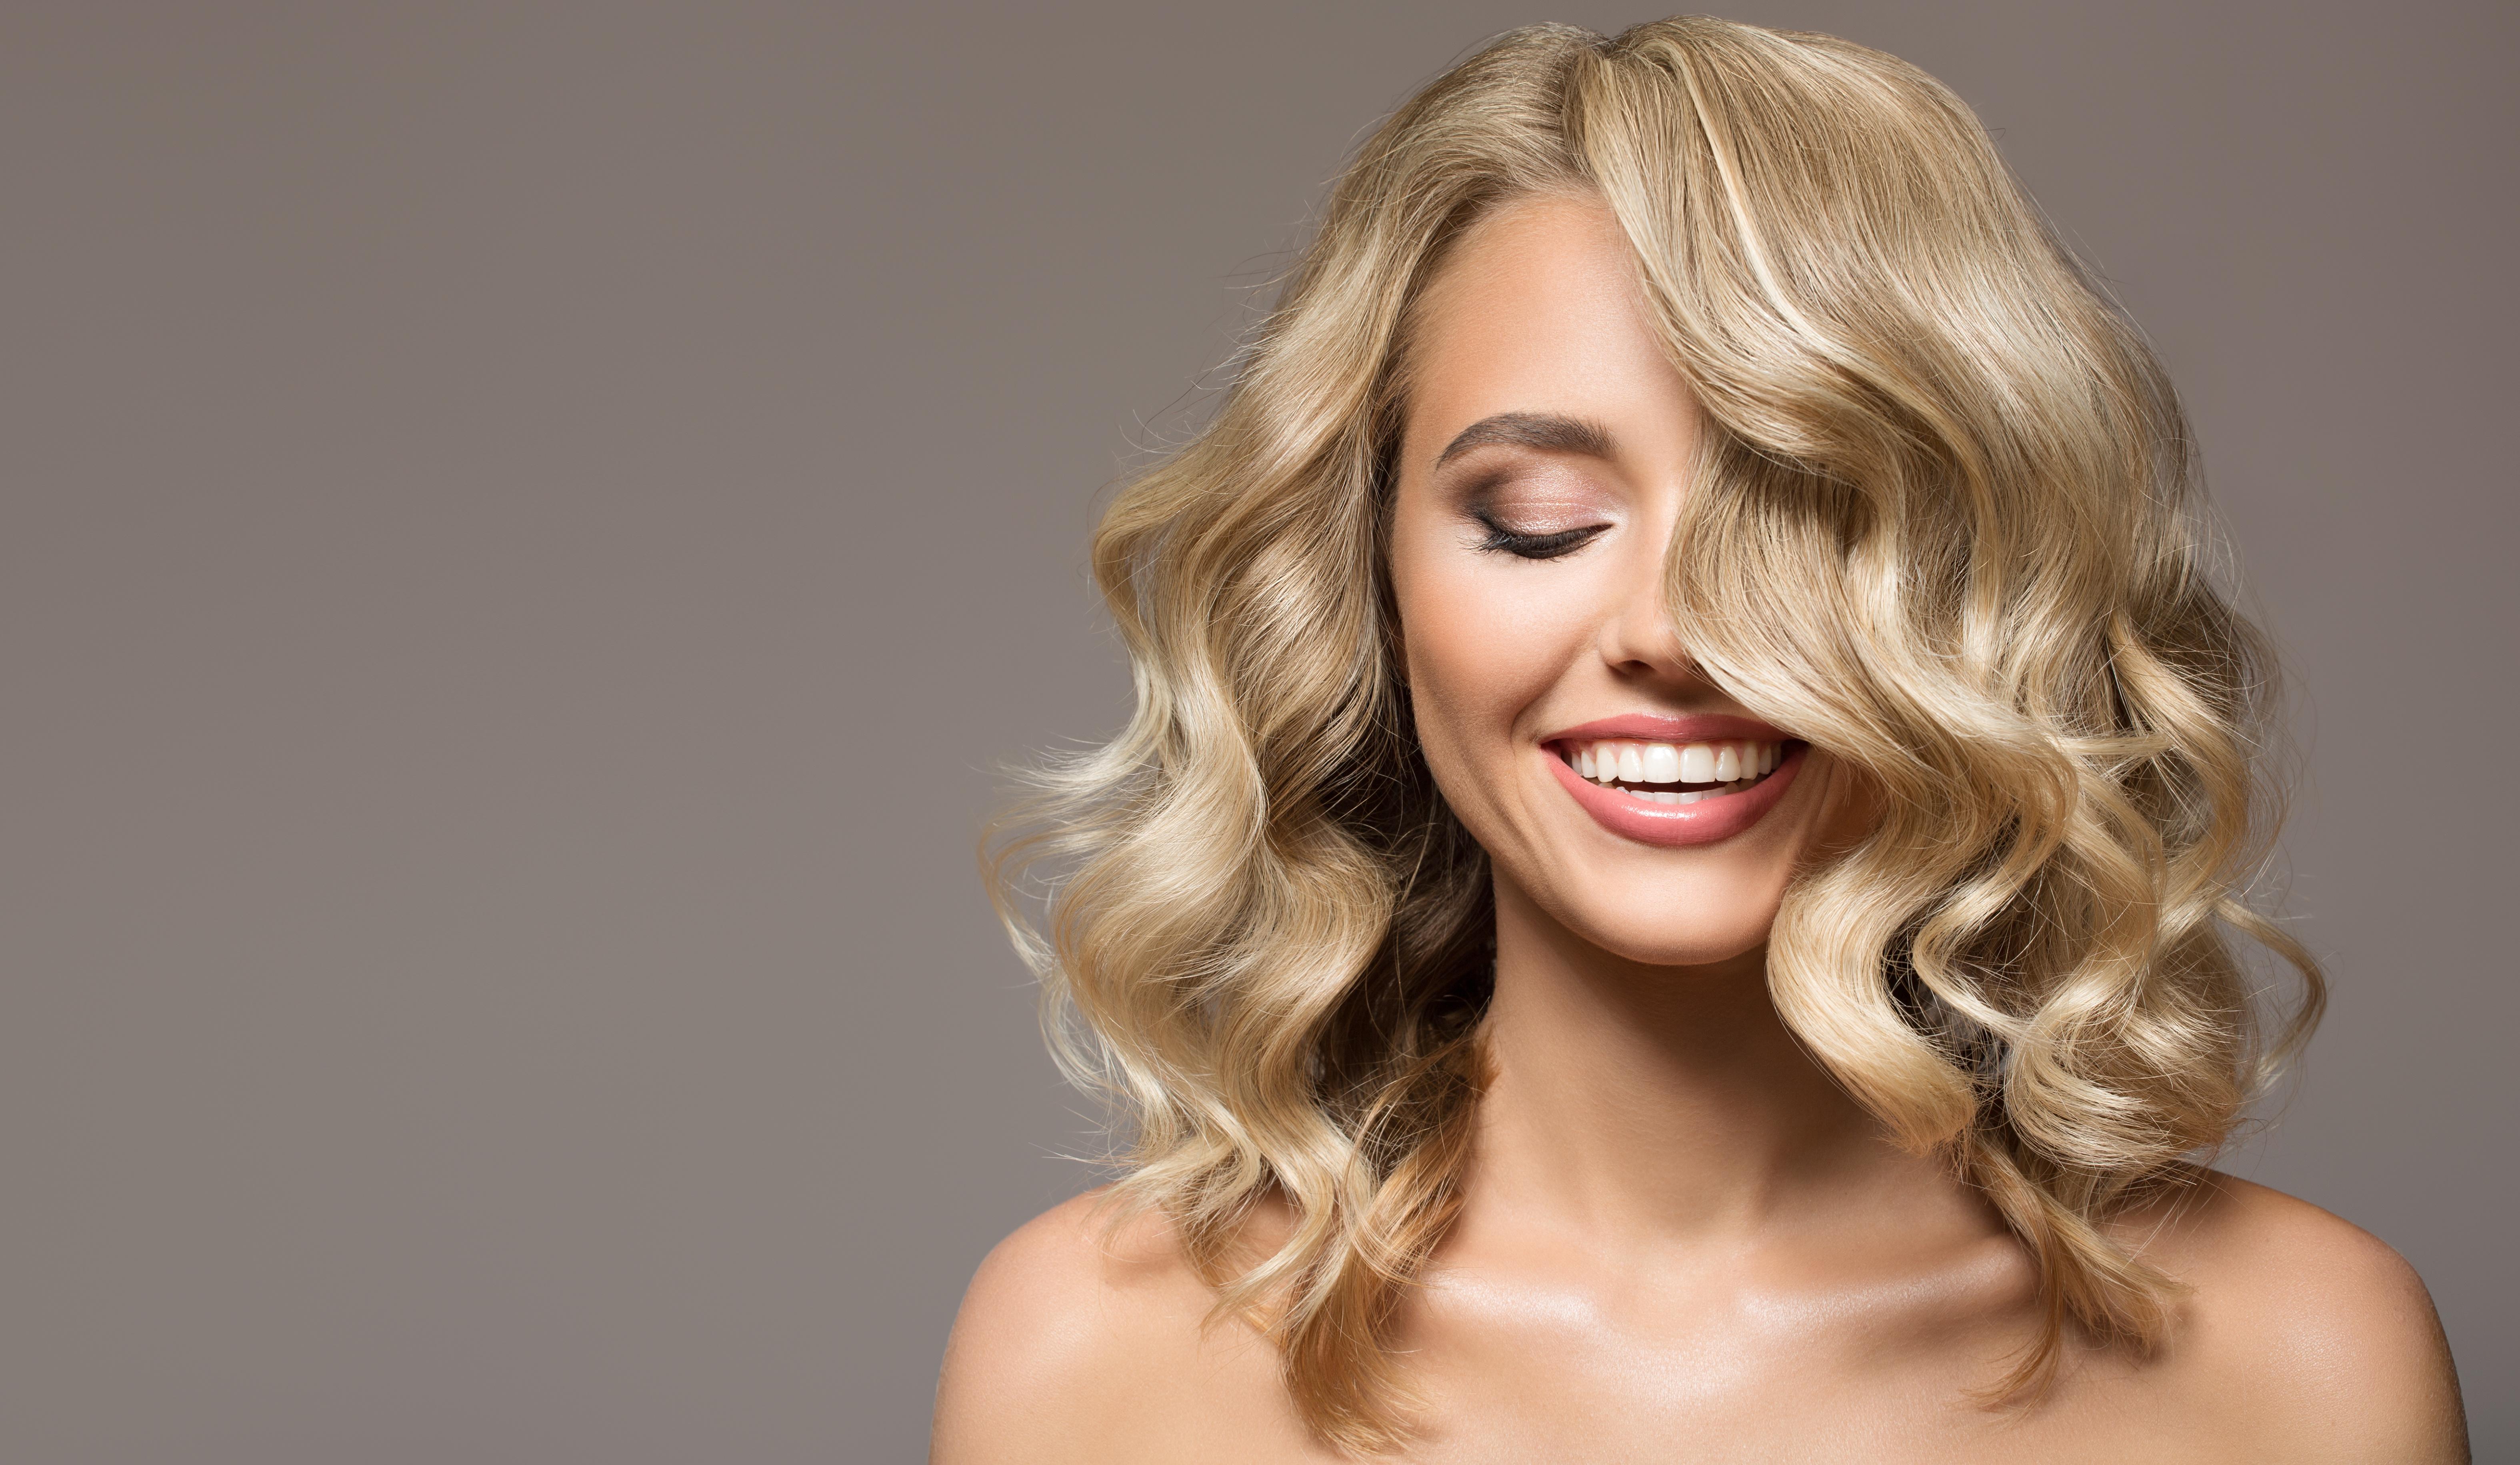 Trucco blondie: consigli e look a cui ispirarsi